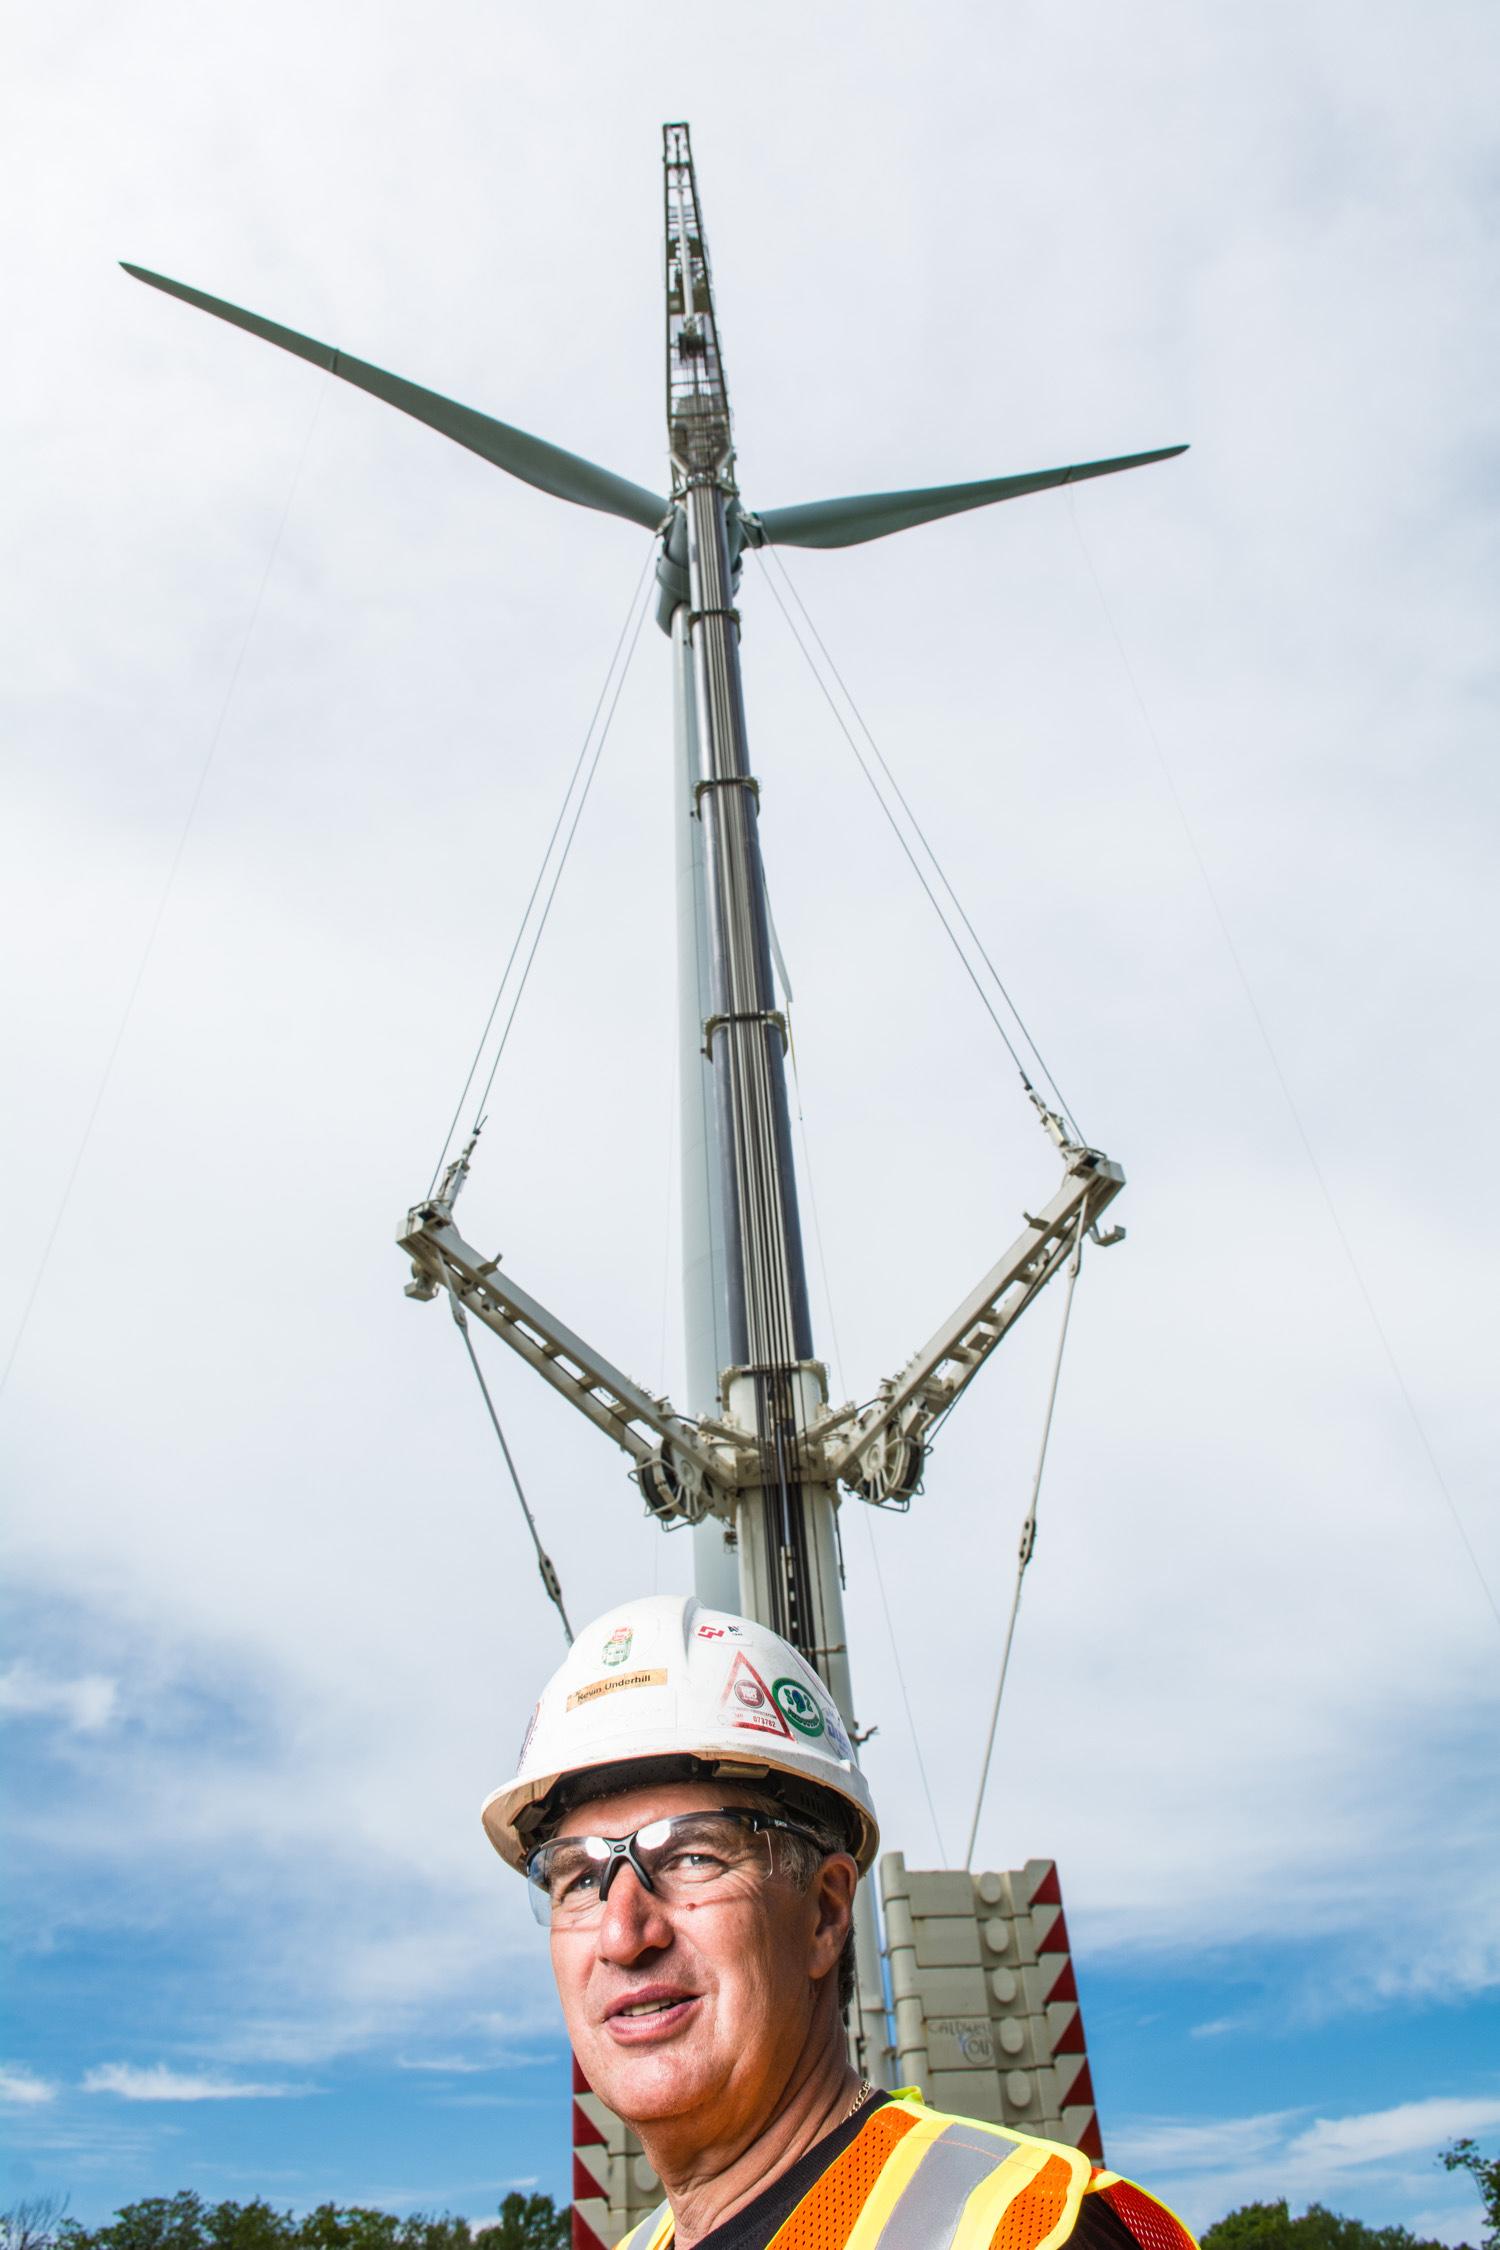 june09 2014-A. W. Leil Cranes and Equipment Limited-promo-Antigonish NS-photo by Aaron McKenzie Fraser-www.amfraser.com-7318.jpg